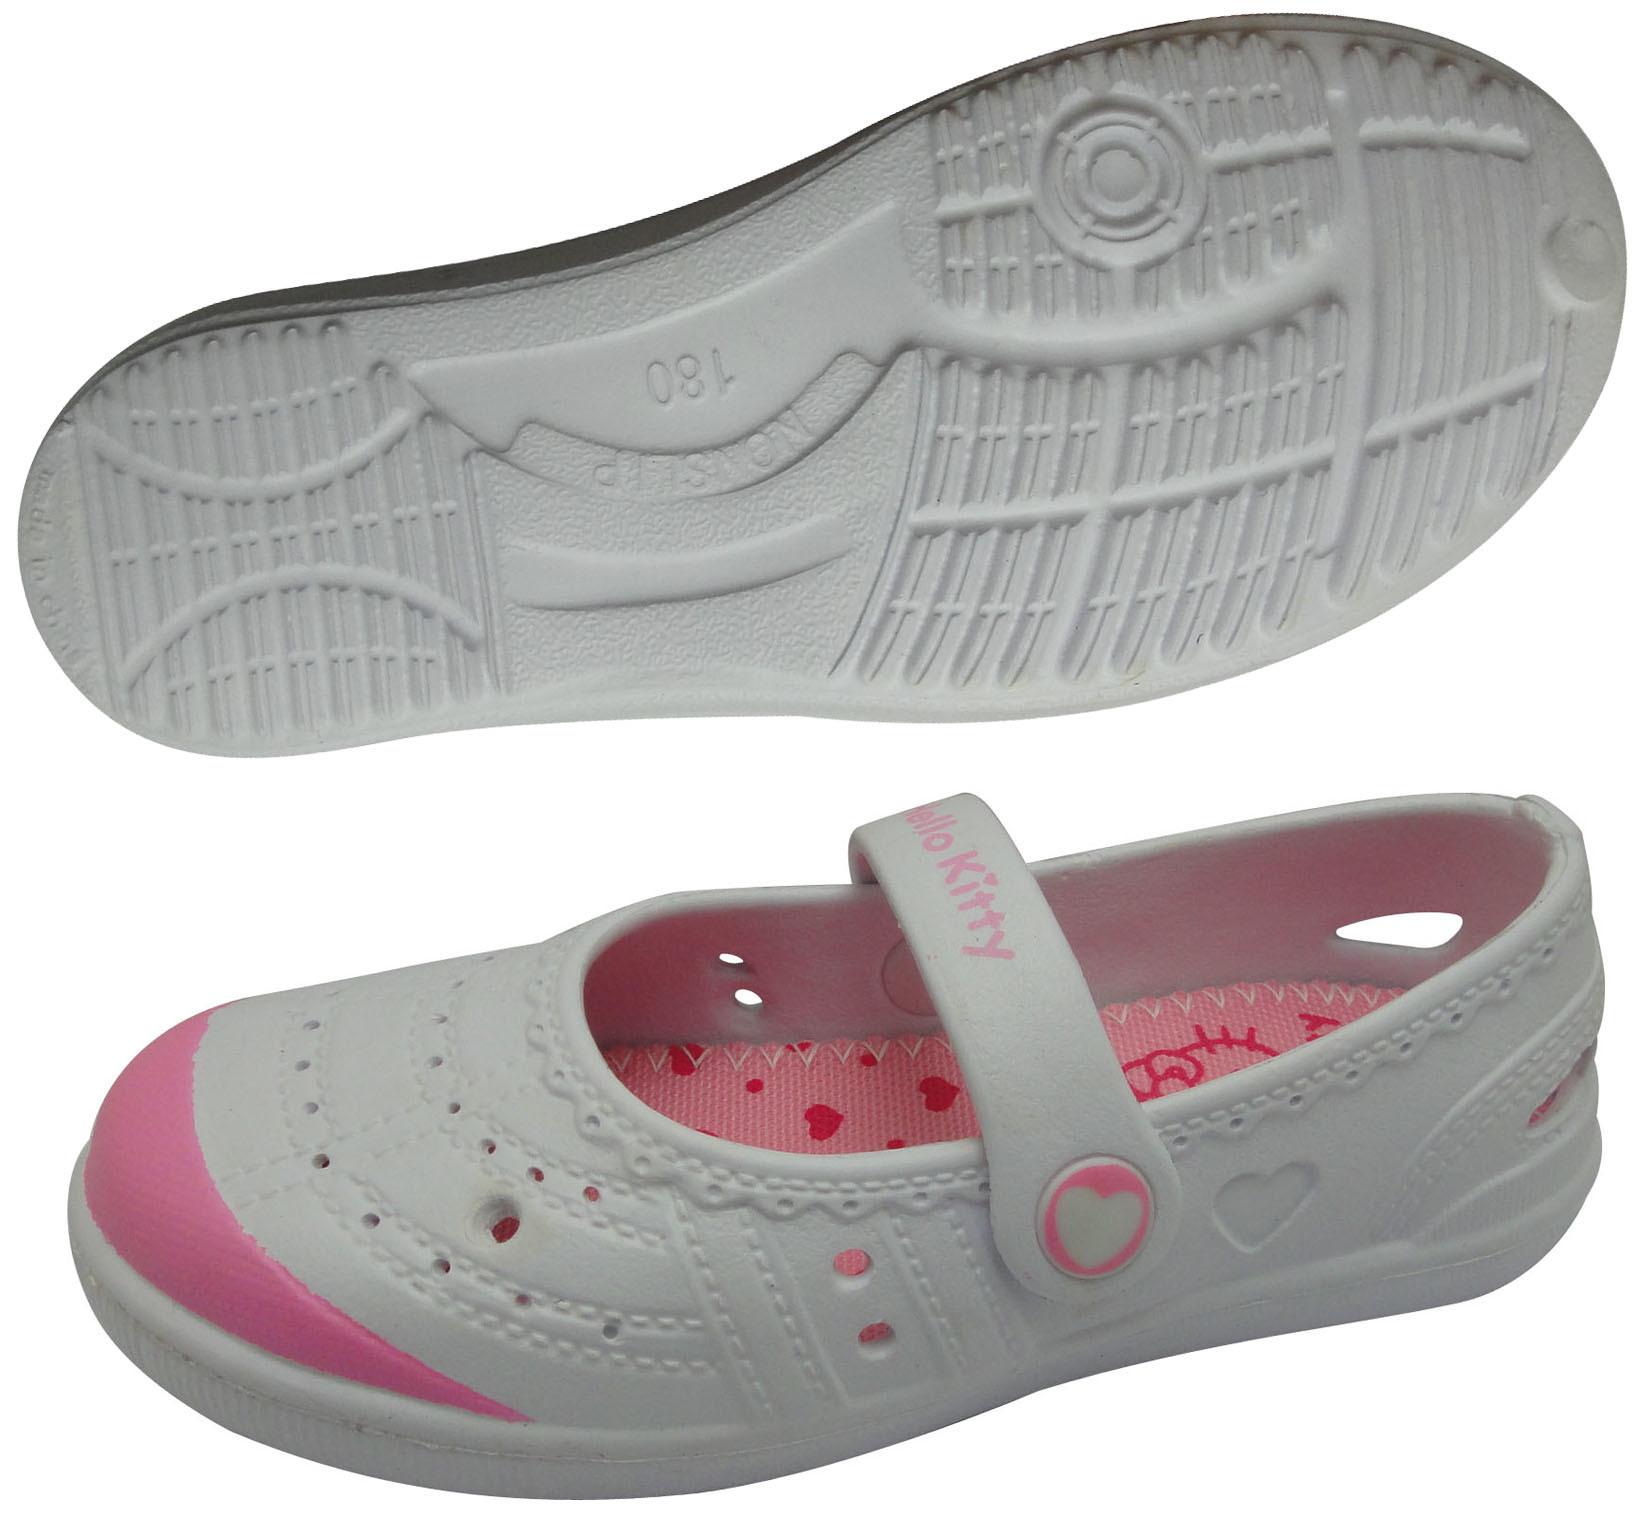 2017 Hot Sale, New Style Children Sandals